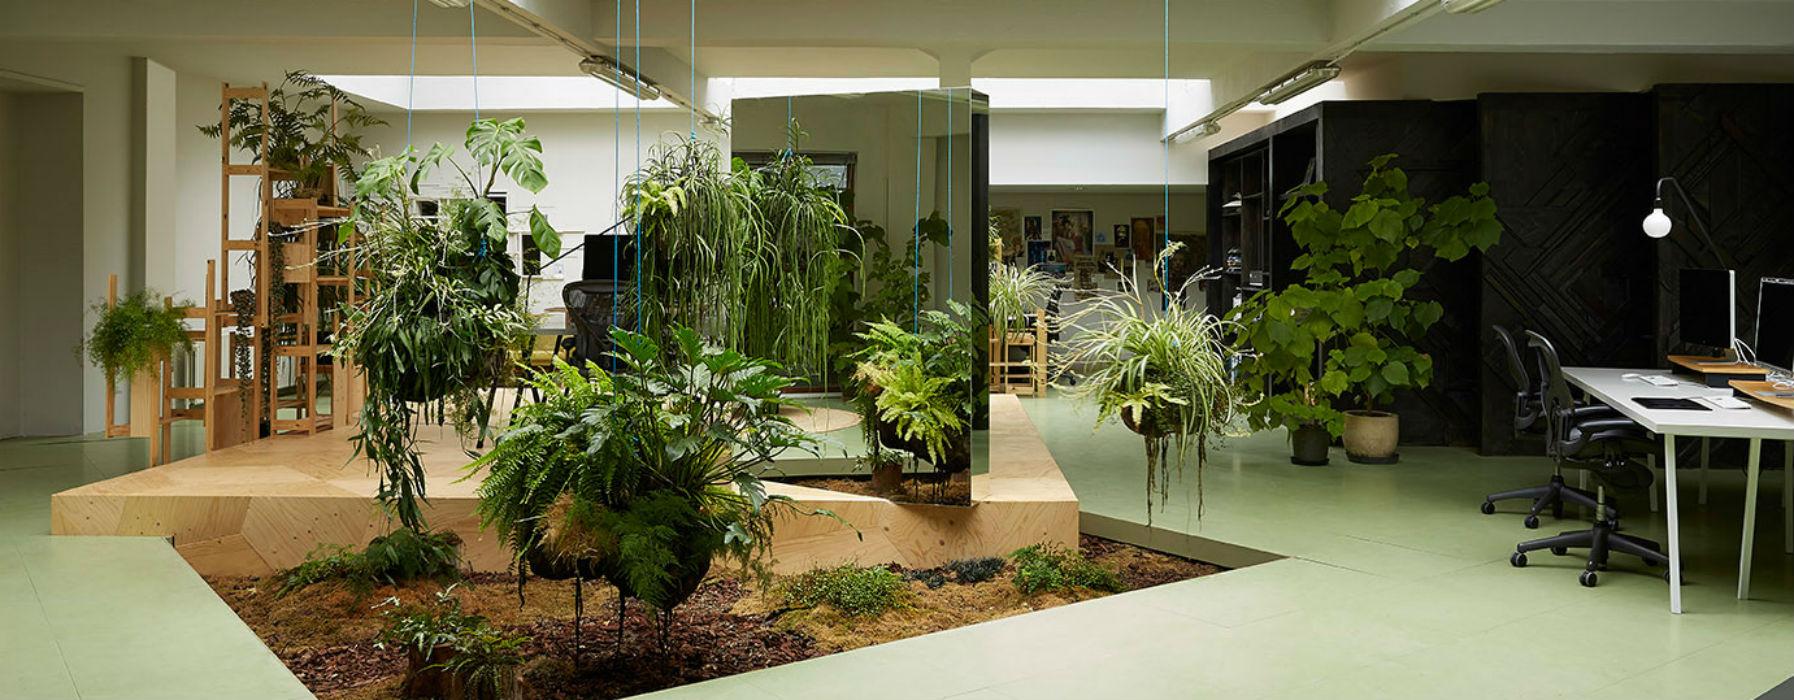 mobili da giardino usati lombardia idee creative e